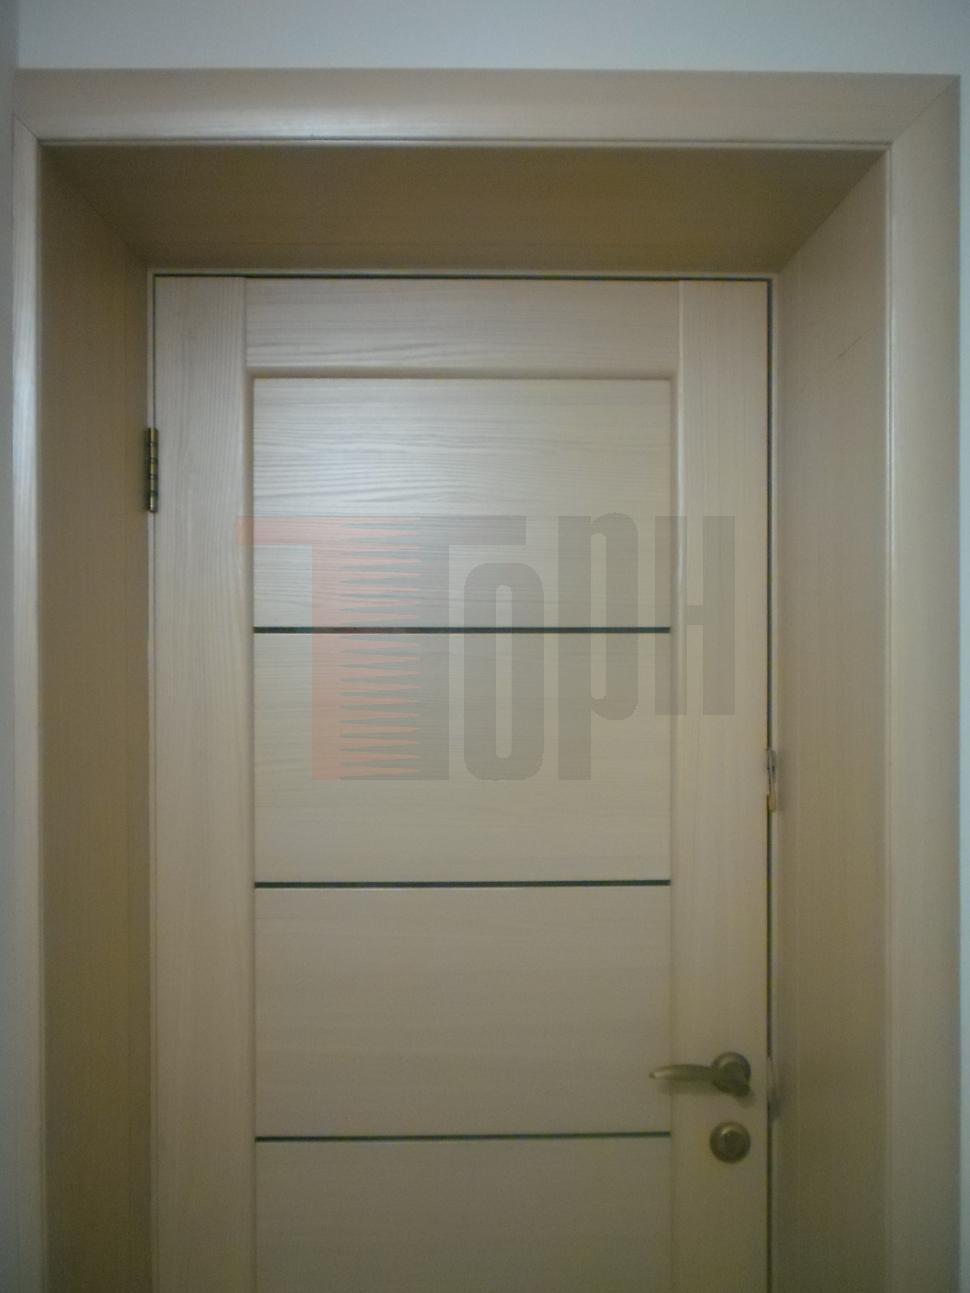 Ponuda Apartmana| Apartmani - grad Pag - Mer062-App1